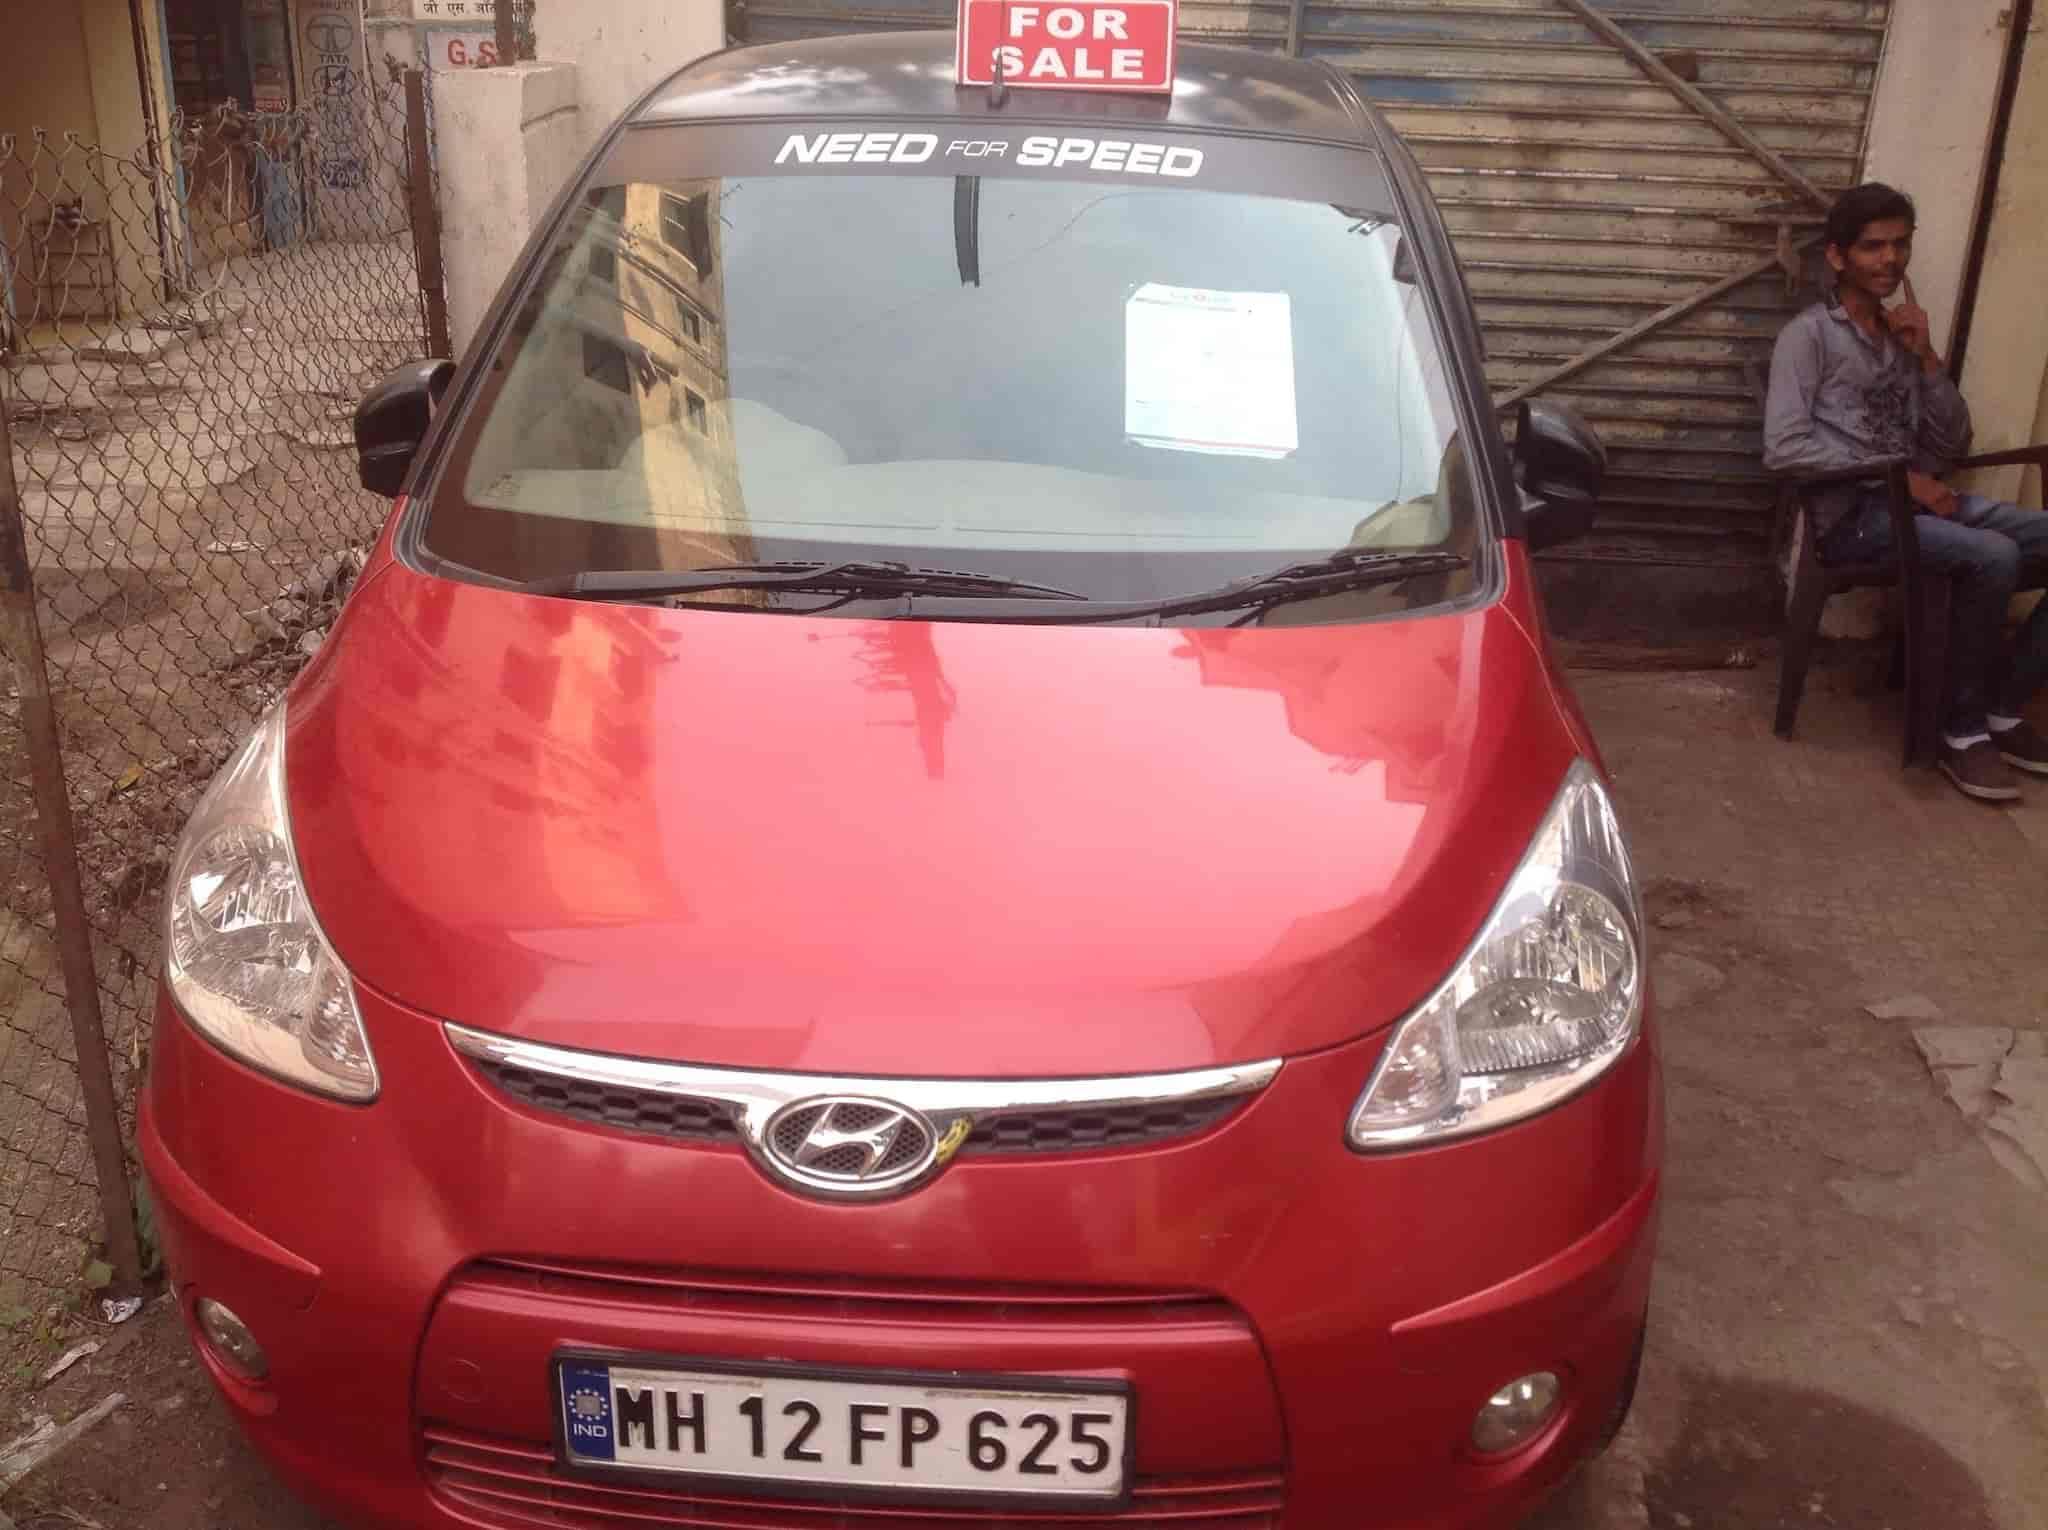 ... Car For Sale - Khurshid Motors Photos, Hadapsar, Pune - Second Hand Car Dealers